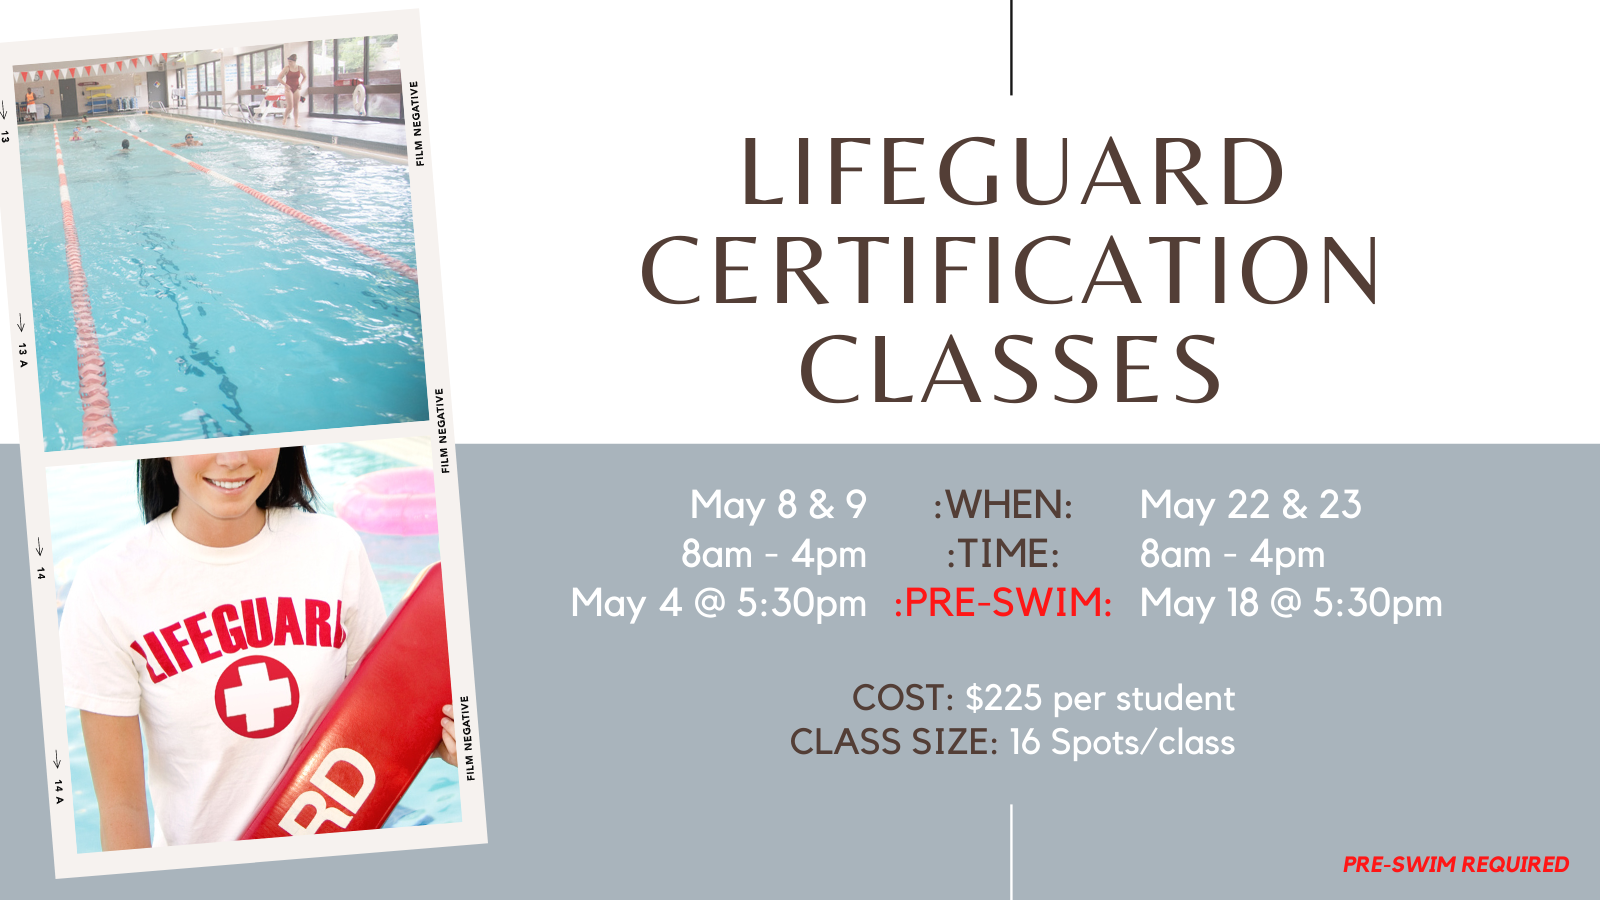 Available April Lifeguard Certification Classes